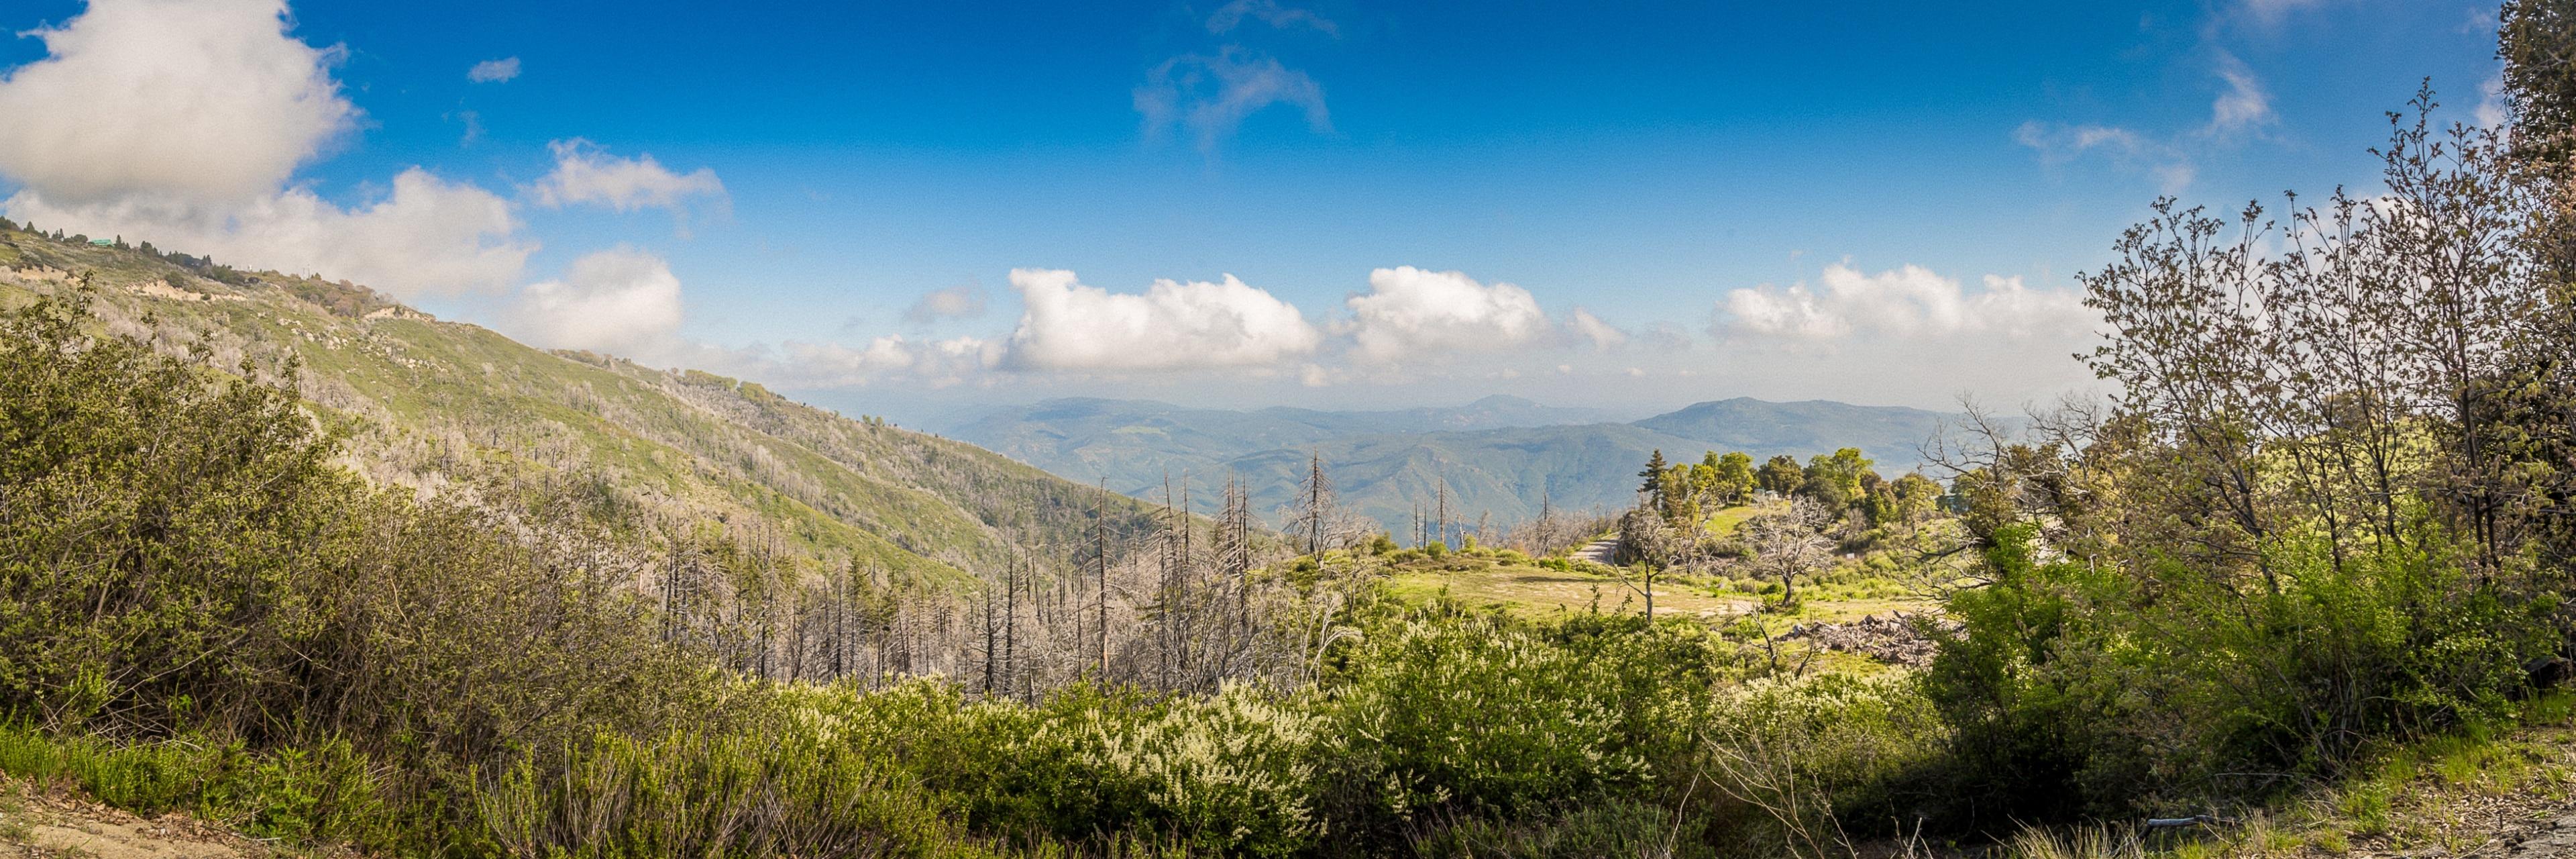 Pauma Valley, California, United States of America